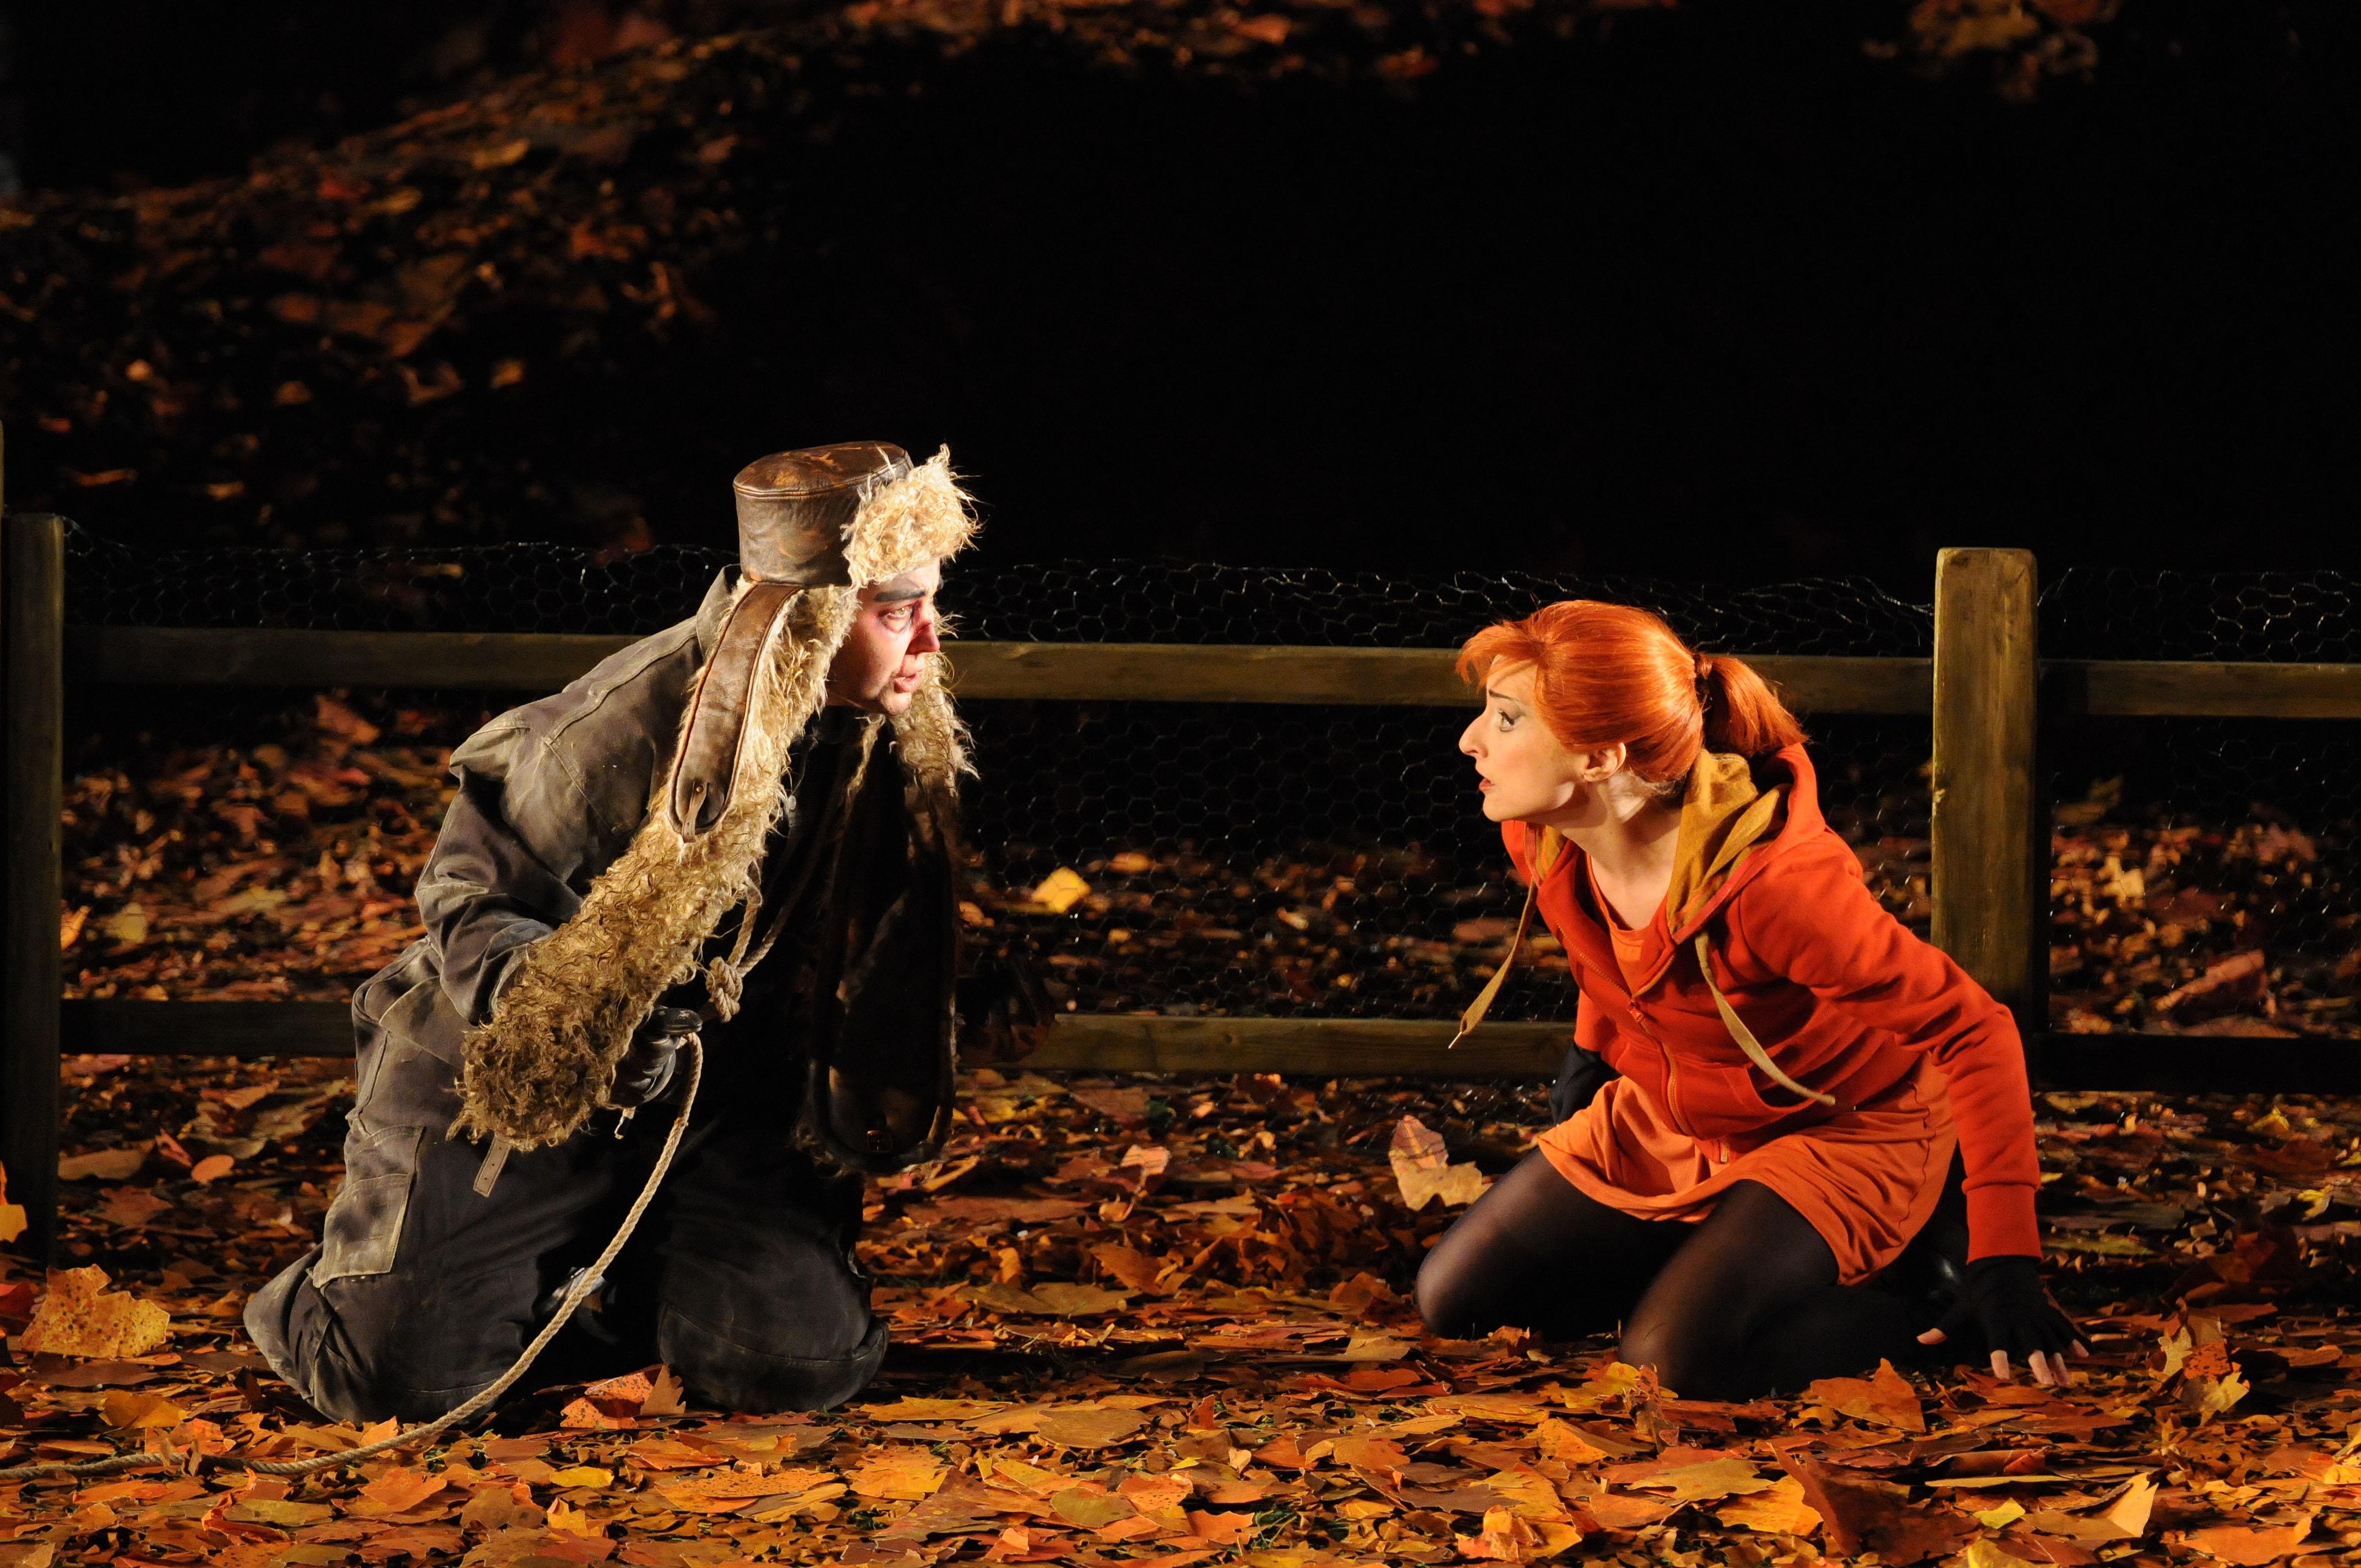 Opéra national du Rhin - La Petite Renarde rusee - photo Alain Kaiser DSC_2830